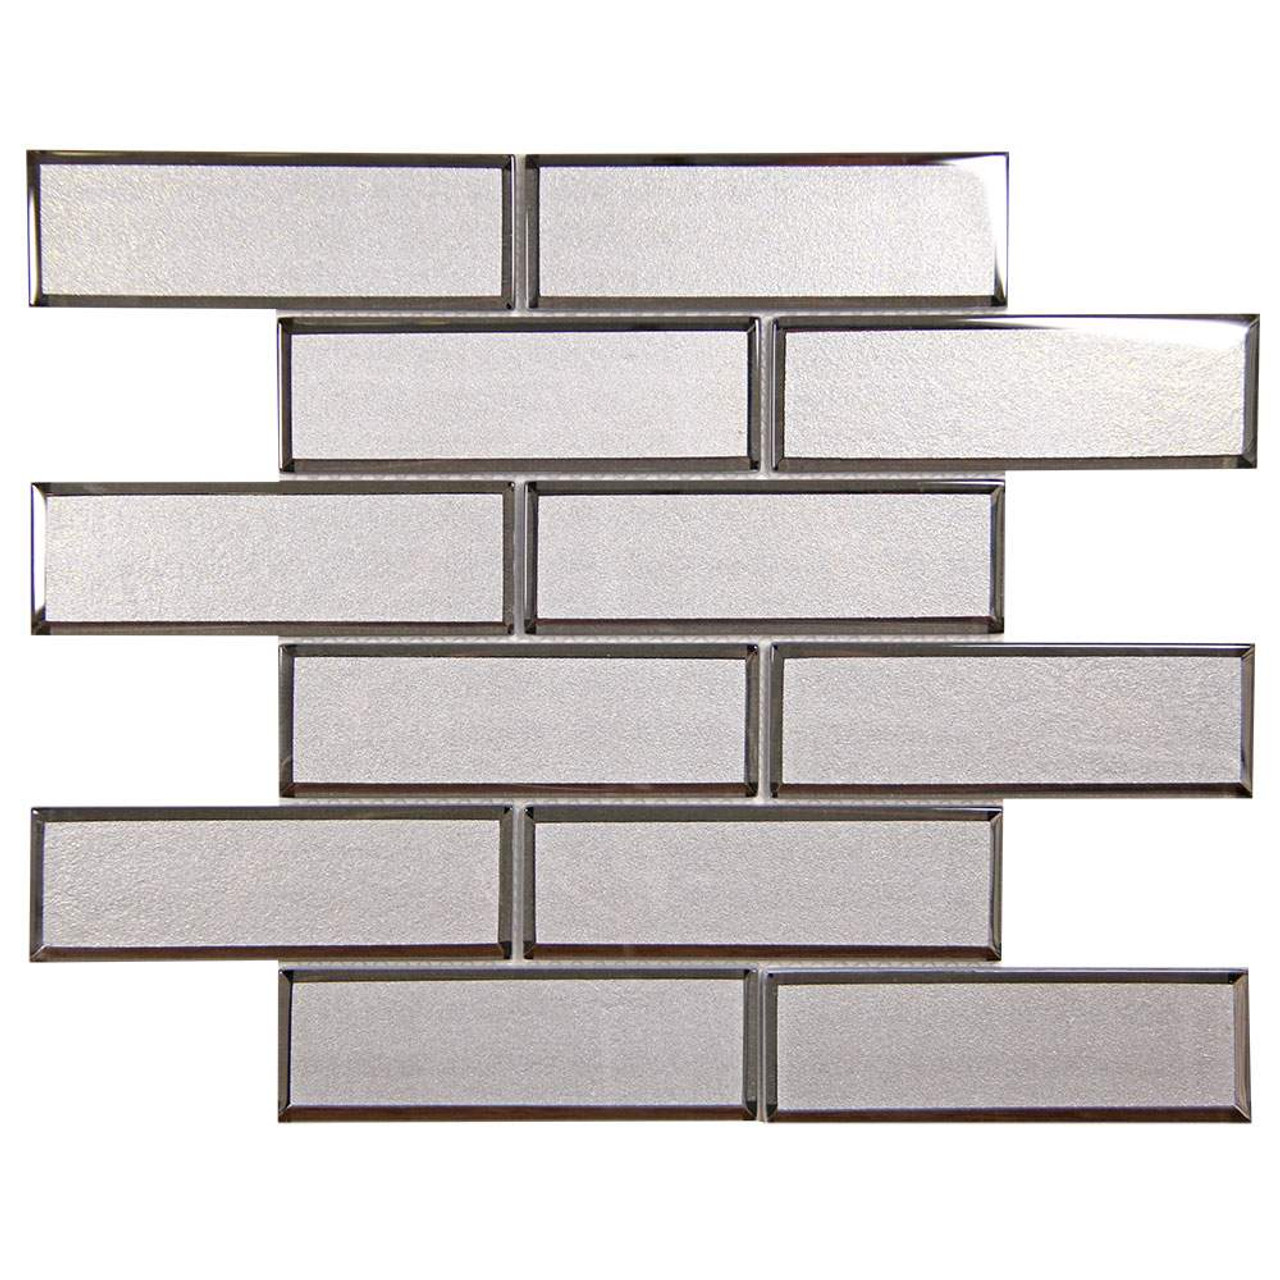 mirror linear white beveled subway glass tile